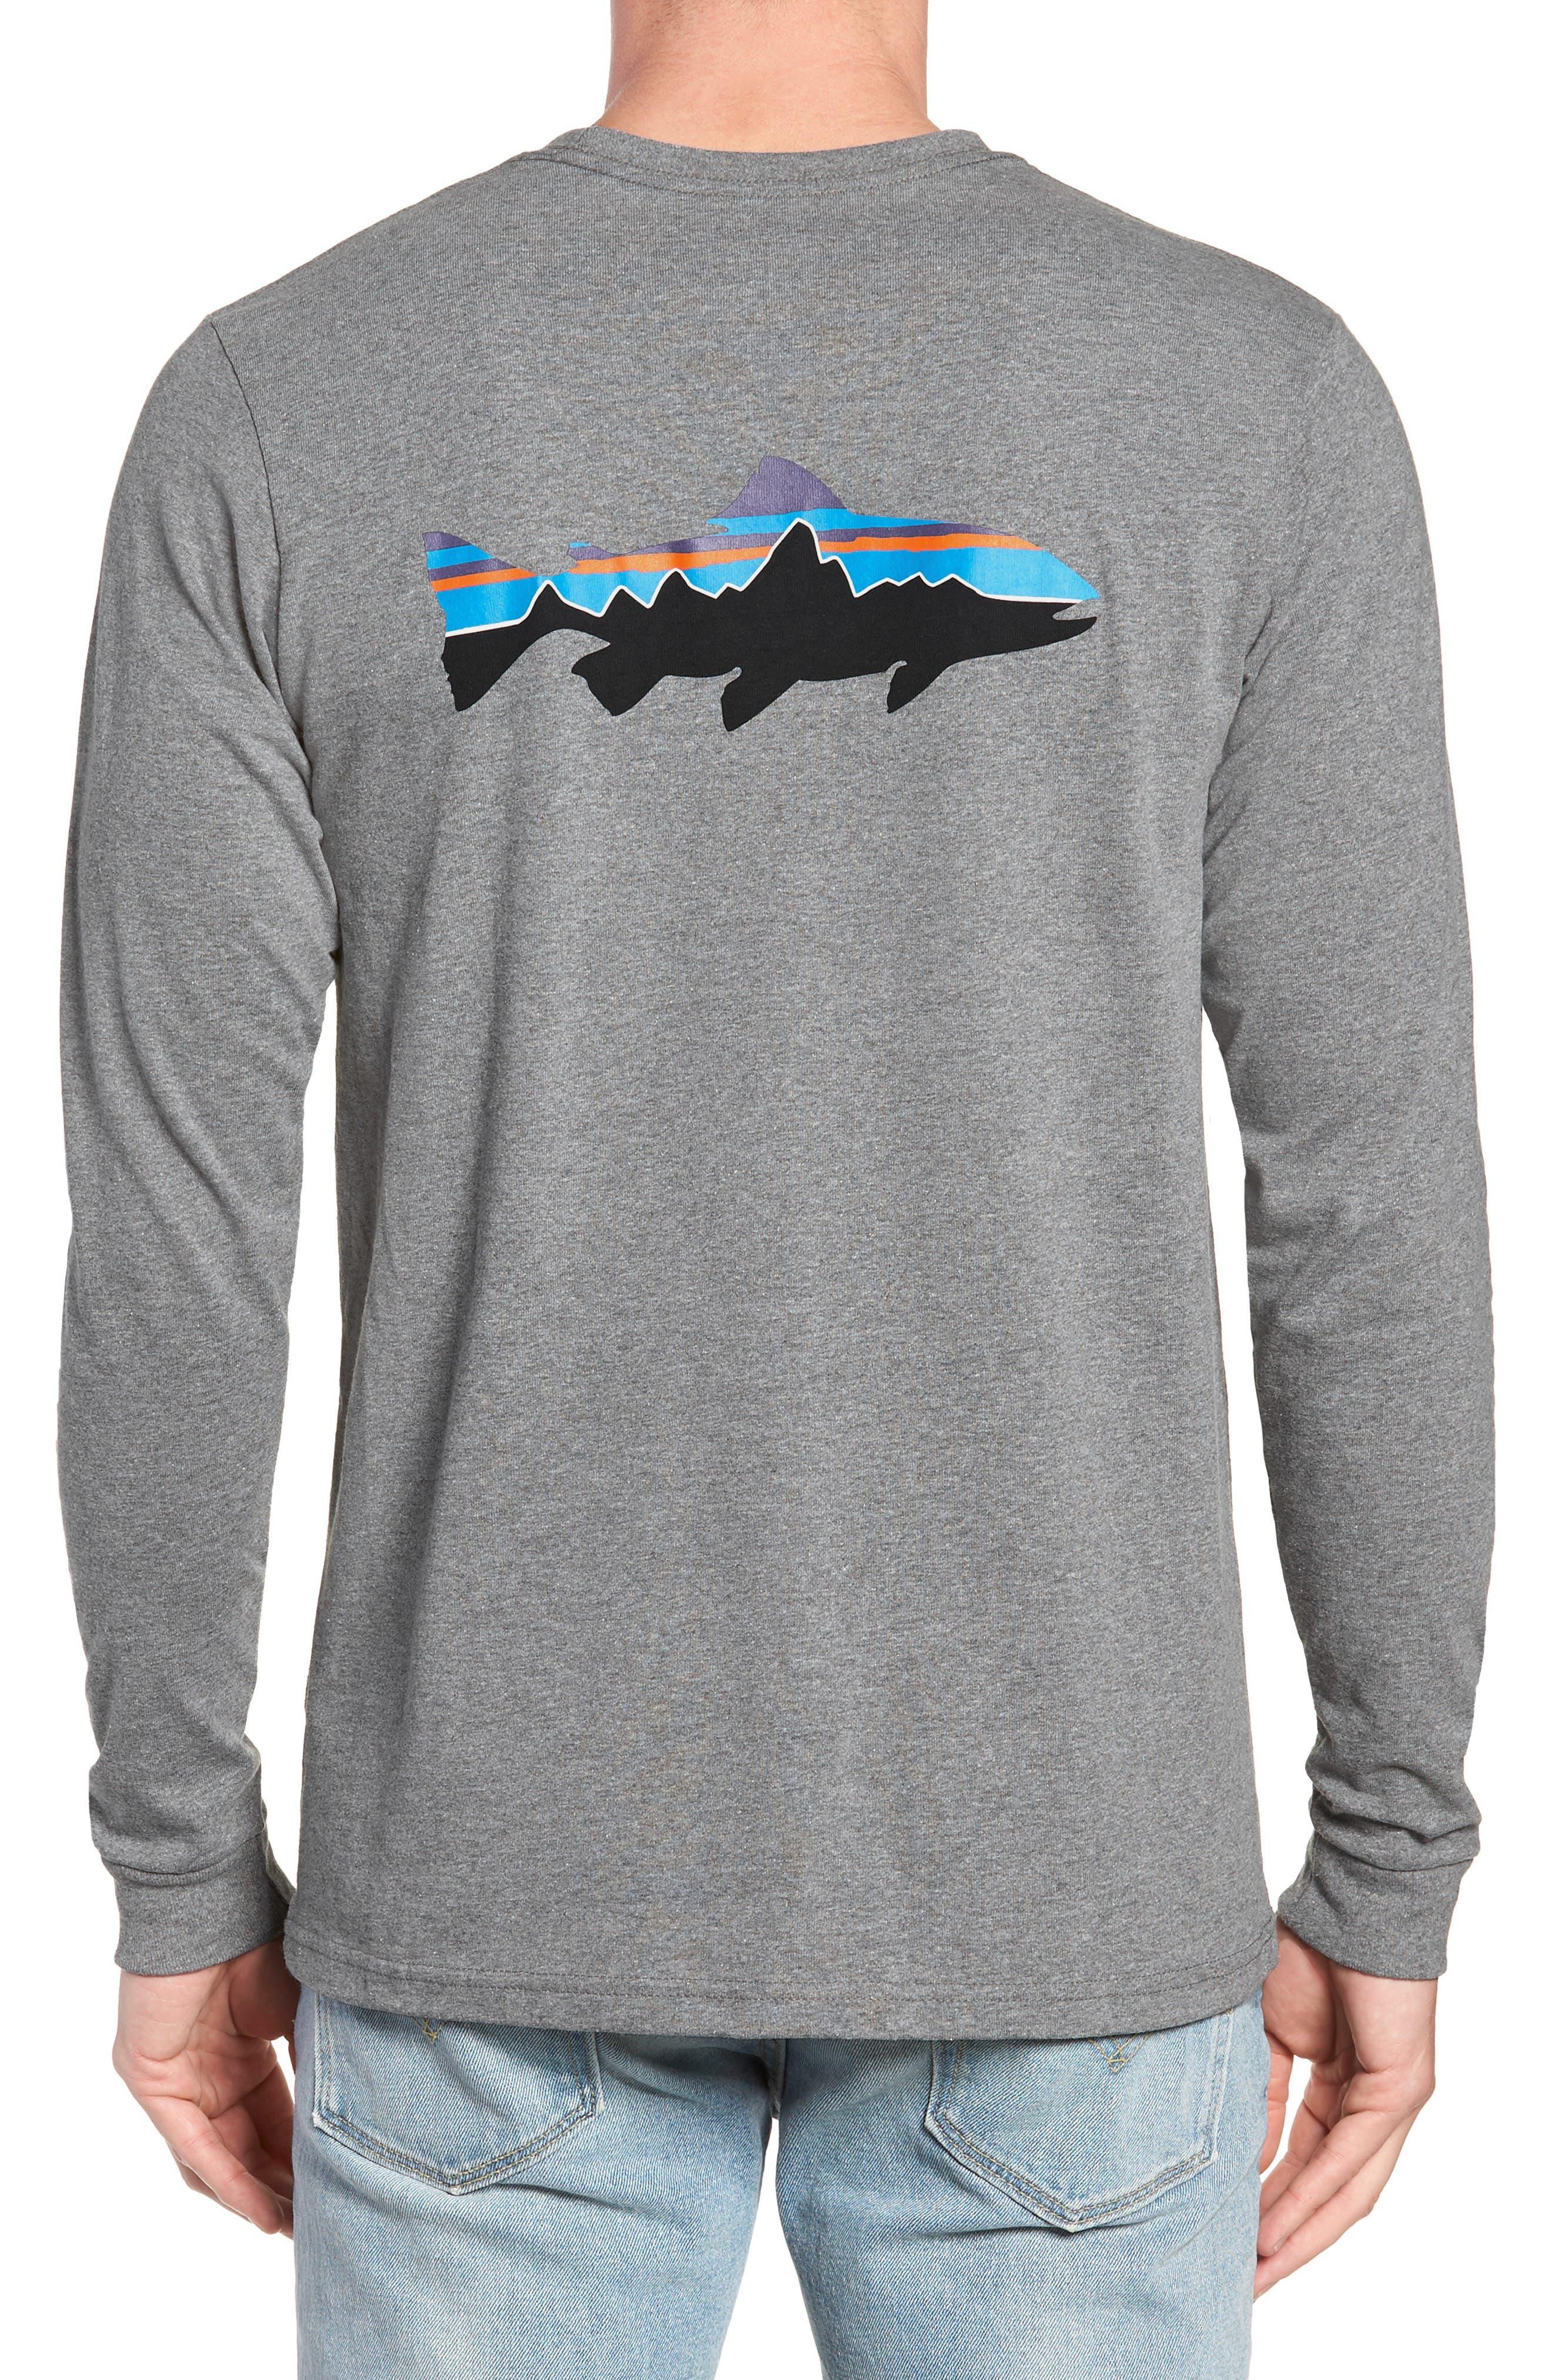 PATAGONIA,                             Fitz Roy Responsibili-Tee Long-Sleeve T-Shirt,                             Alternate thumbnail 2, color,                             020